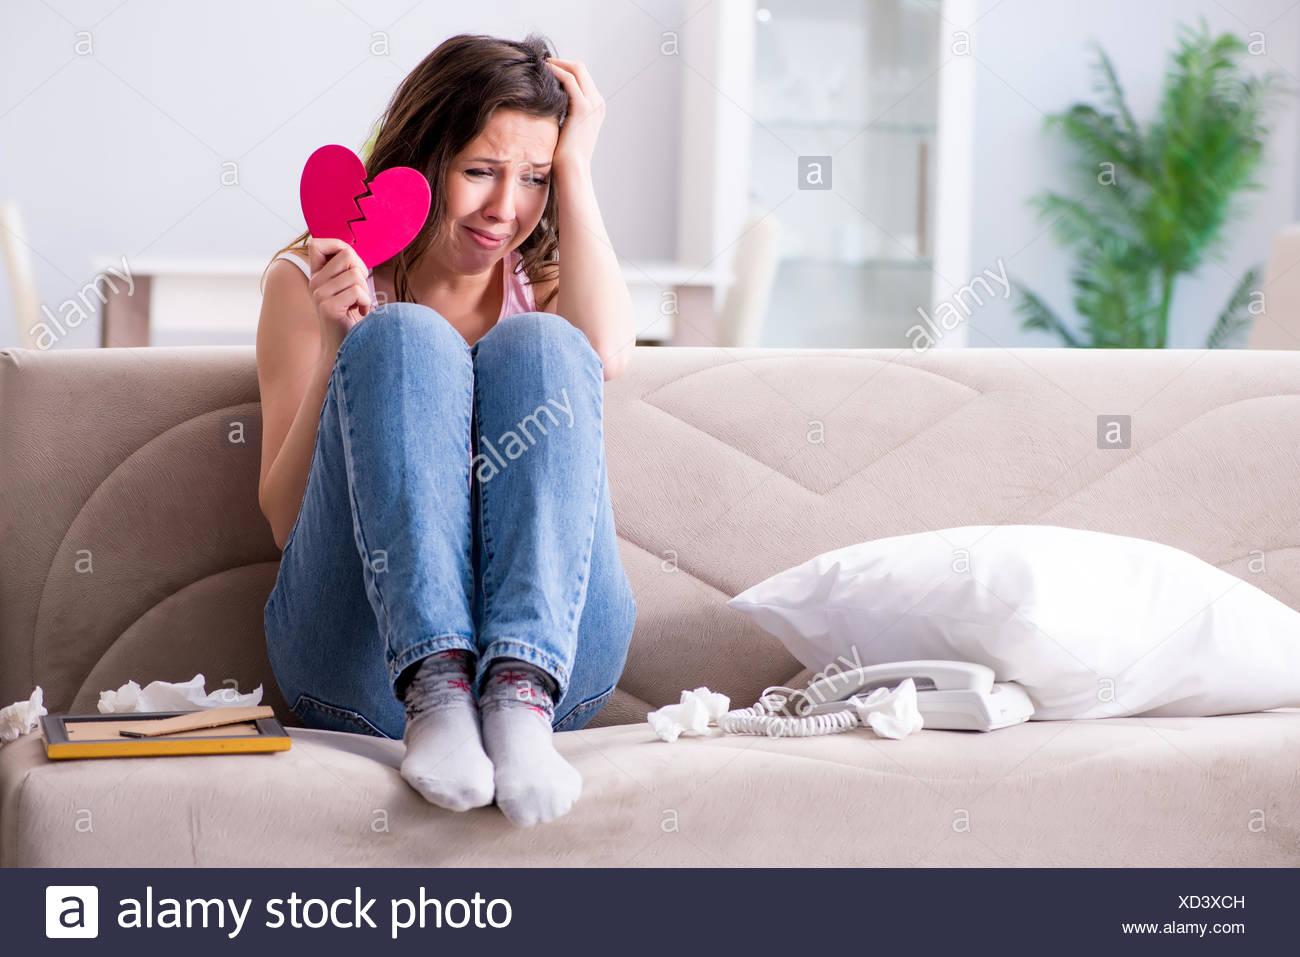 Broken woman heart in relationship concept - Stock Image